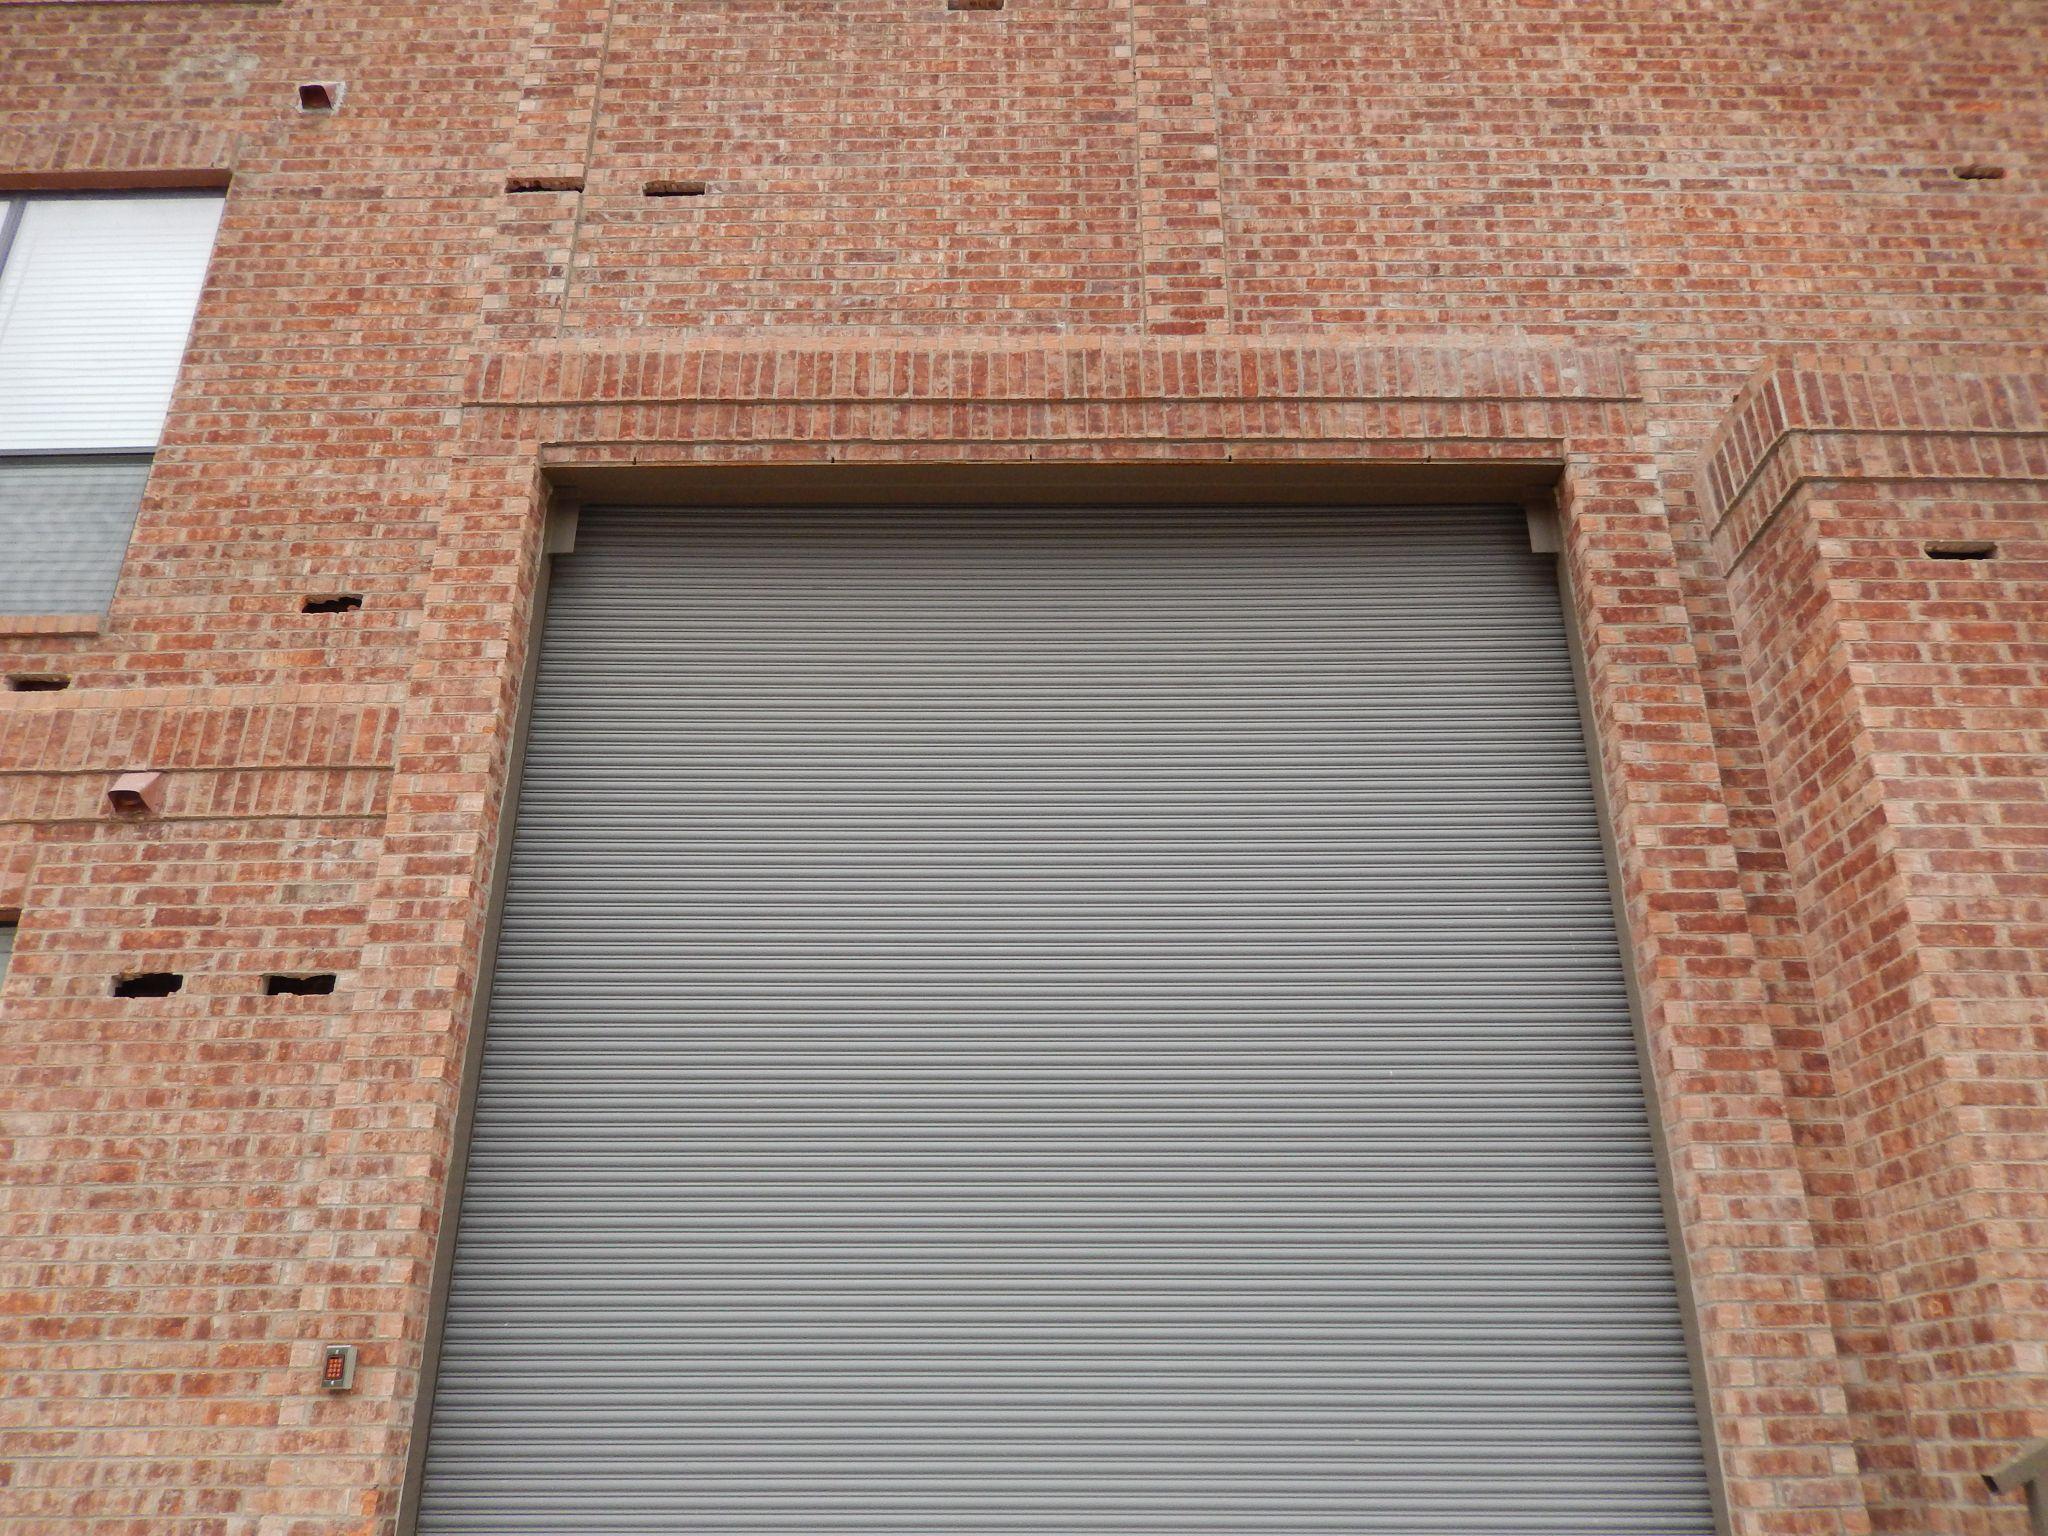 Durability of Brick Veneer: Remediation of helical anchors